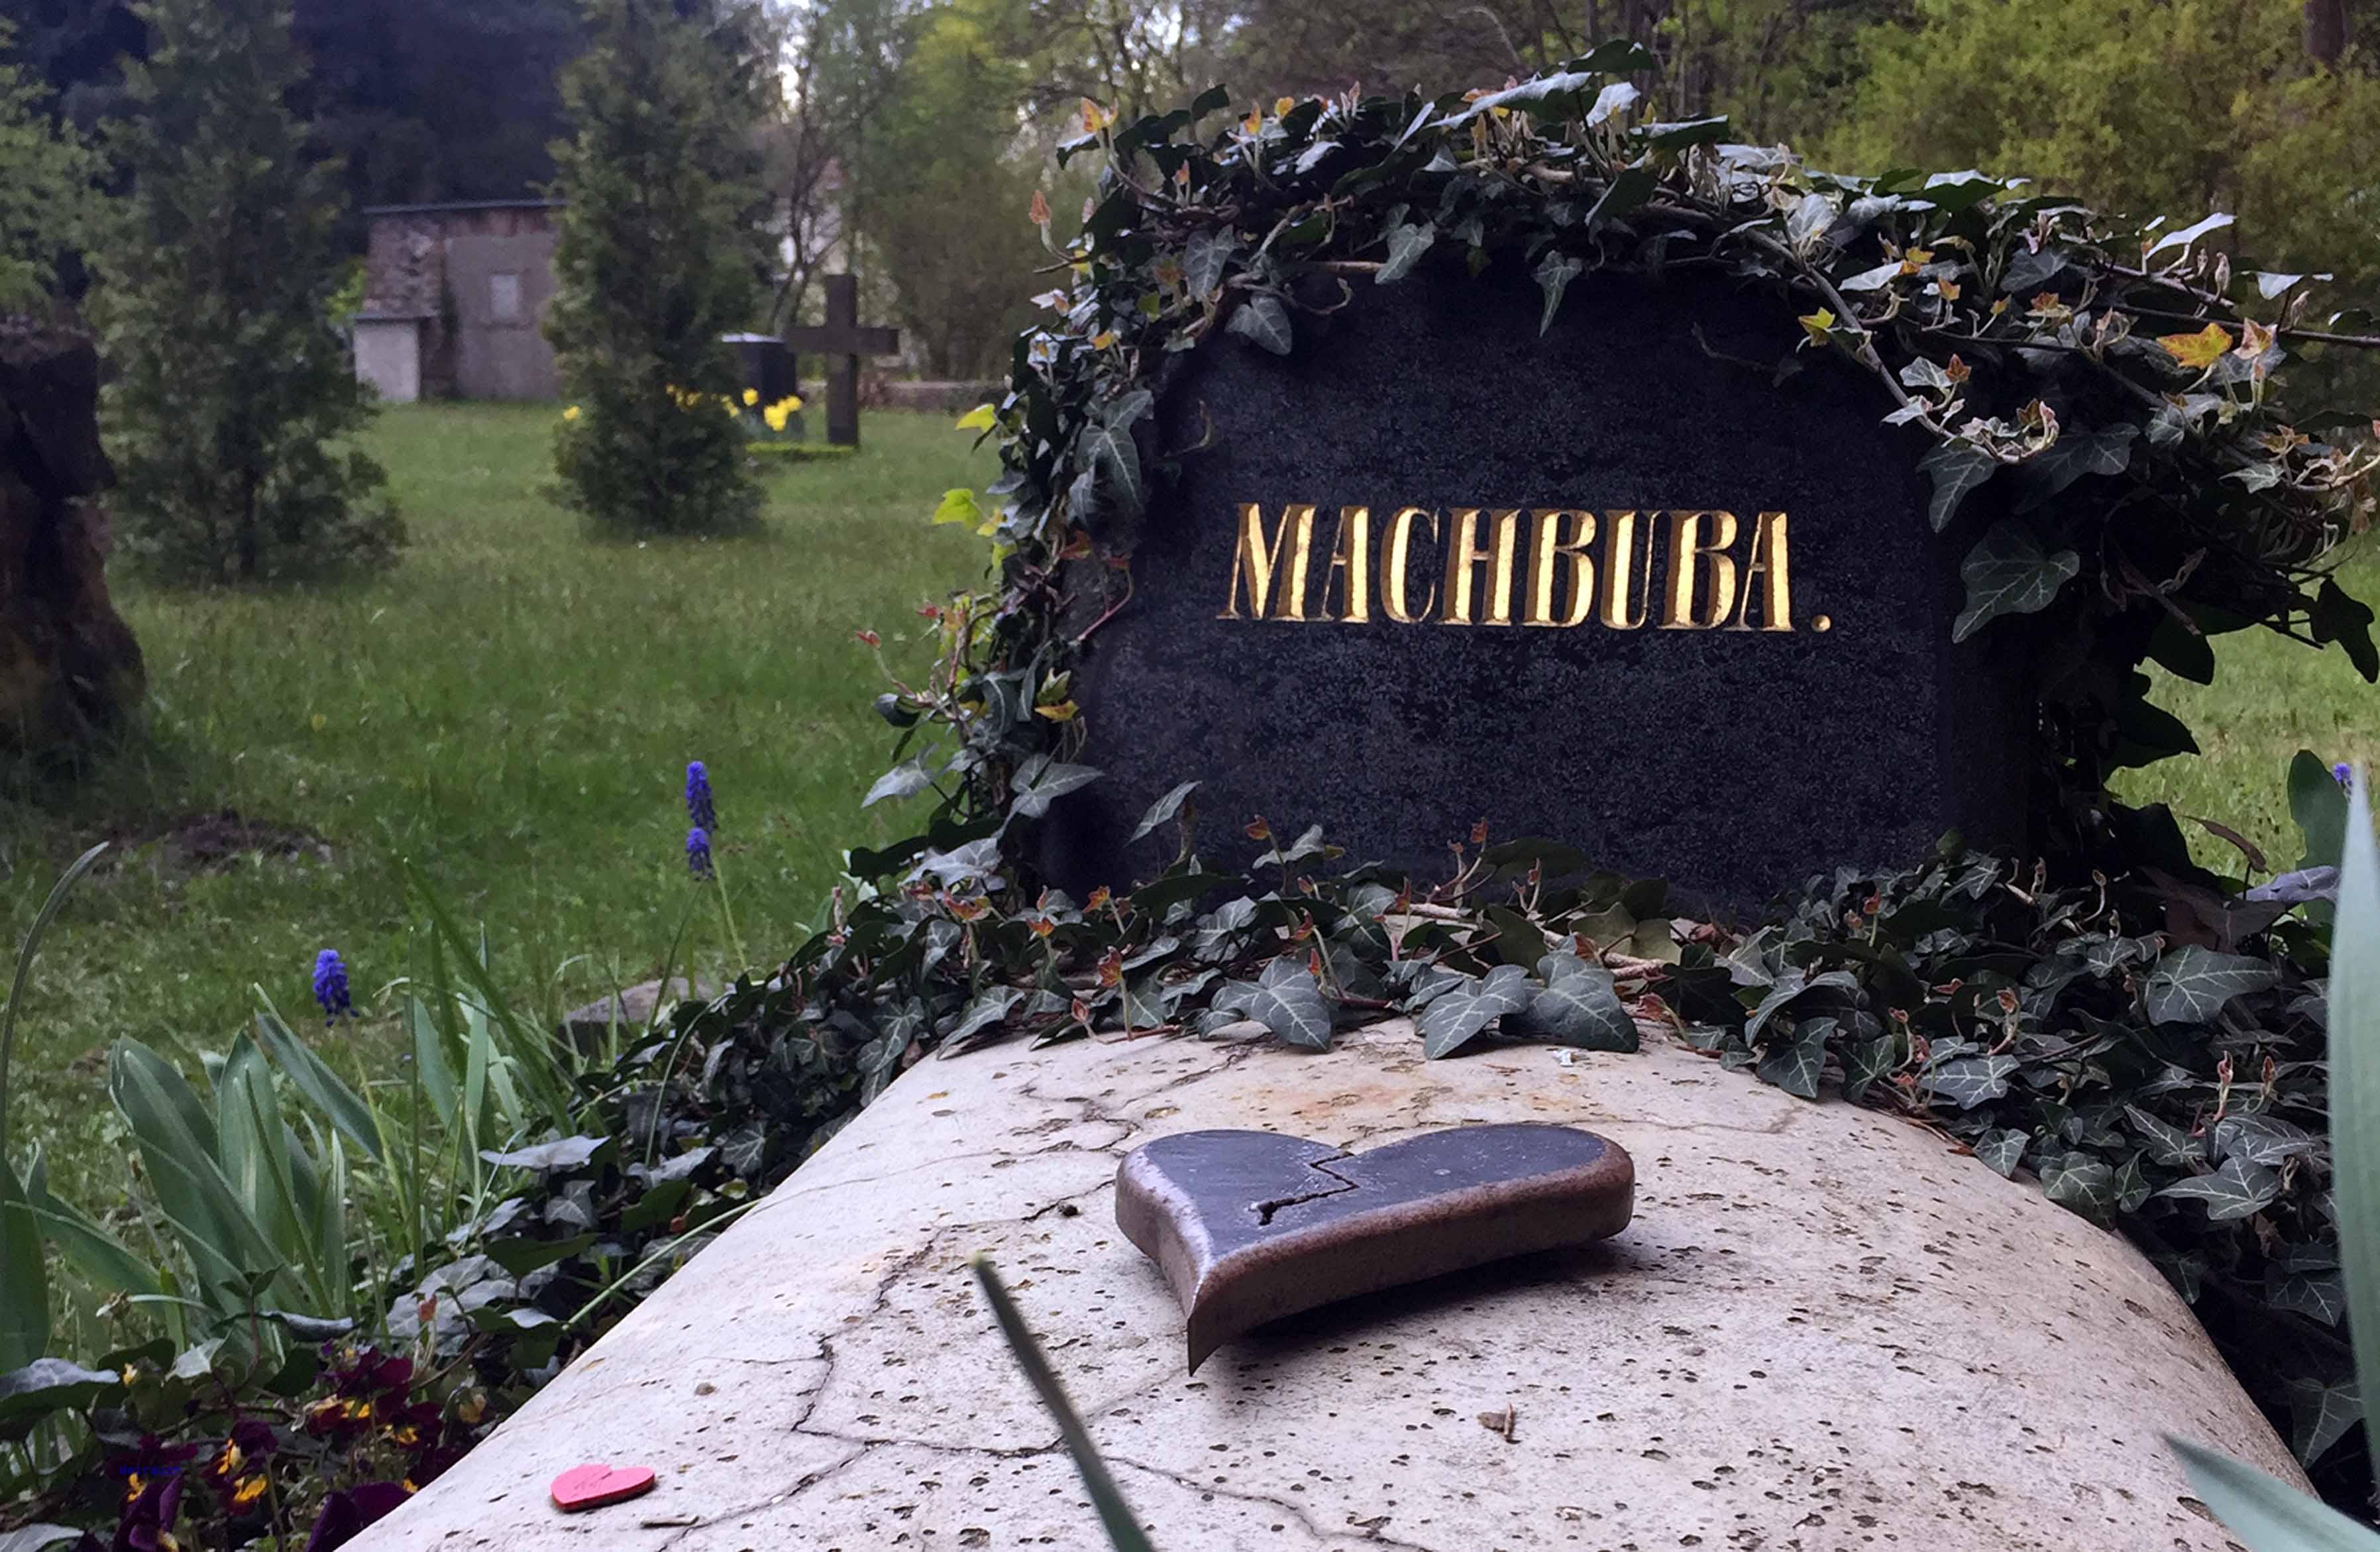 Grab von Machbuba in Bad Muskau